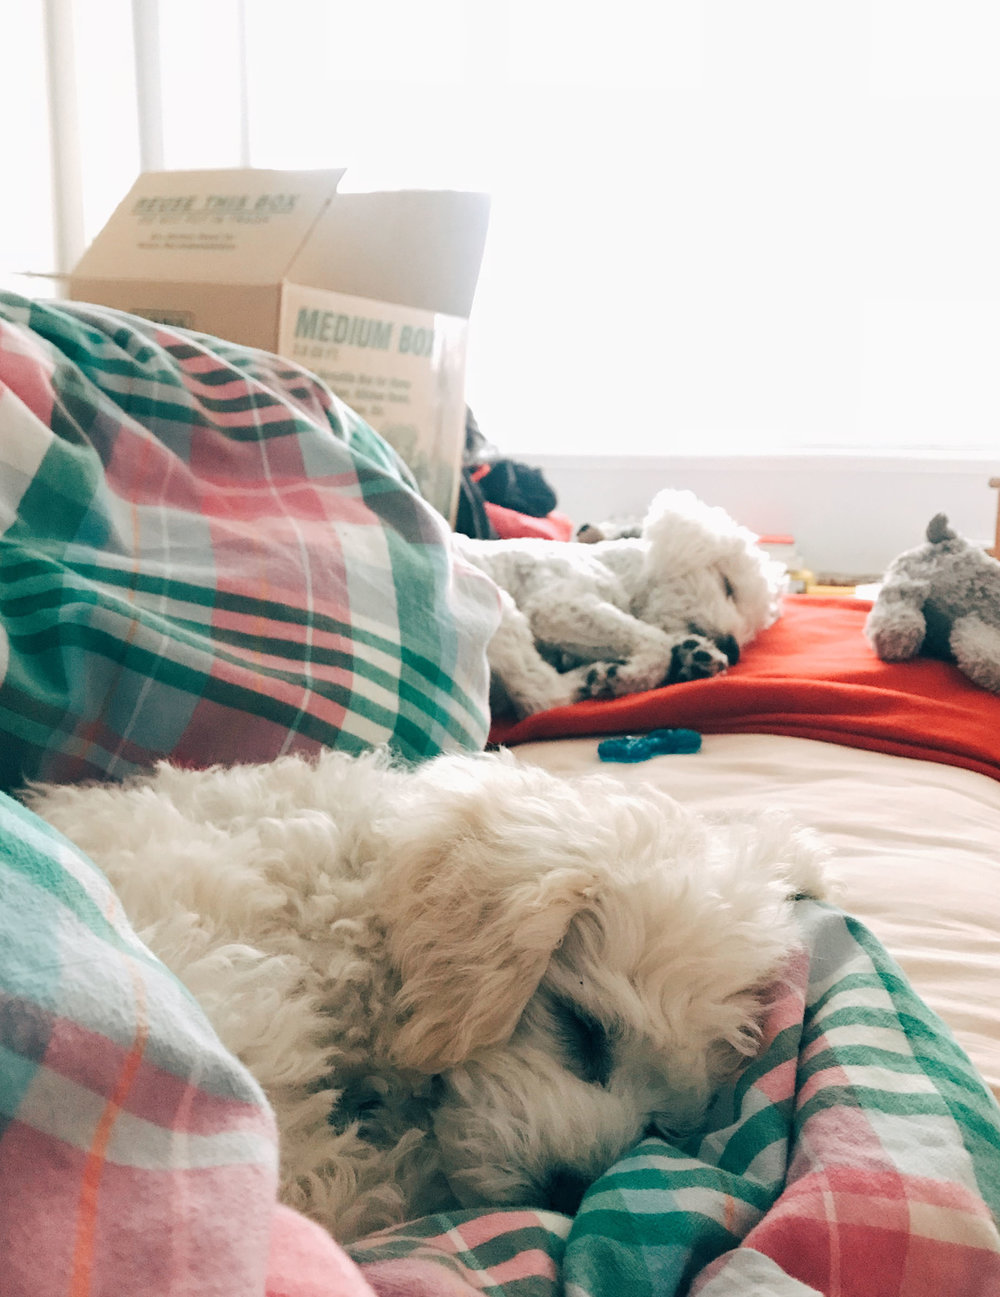 PUPPIES-SLEEPING-BED.jpg